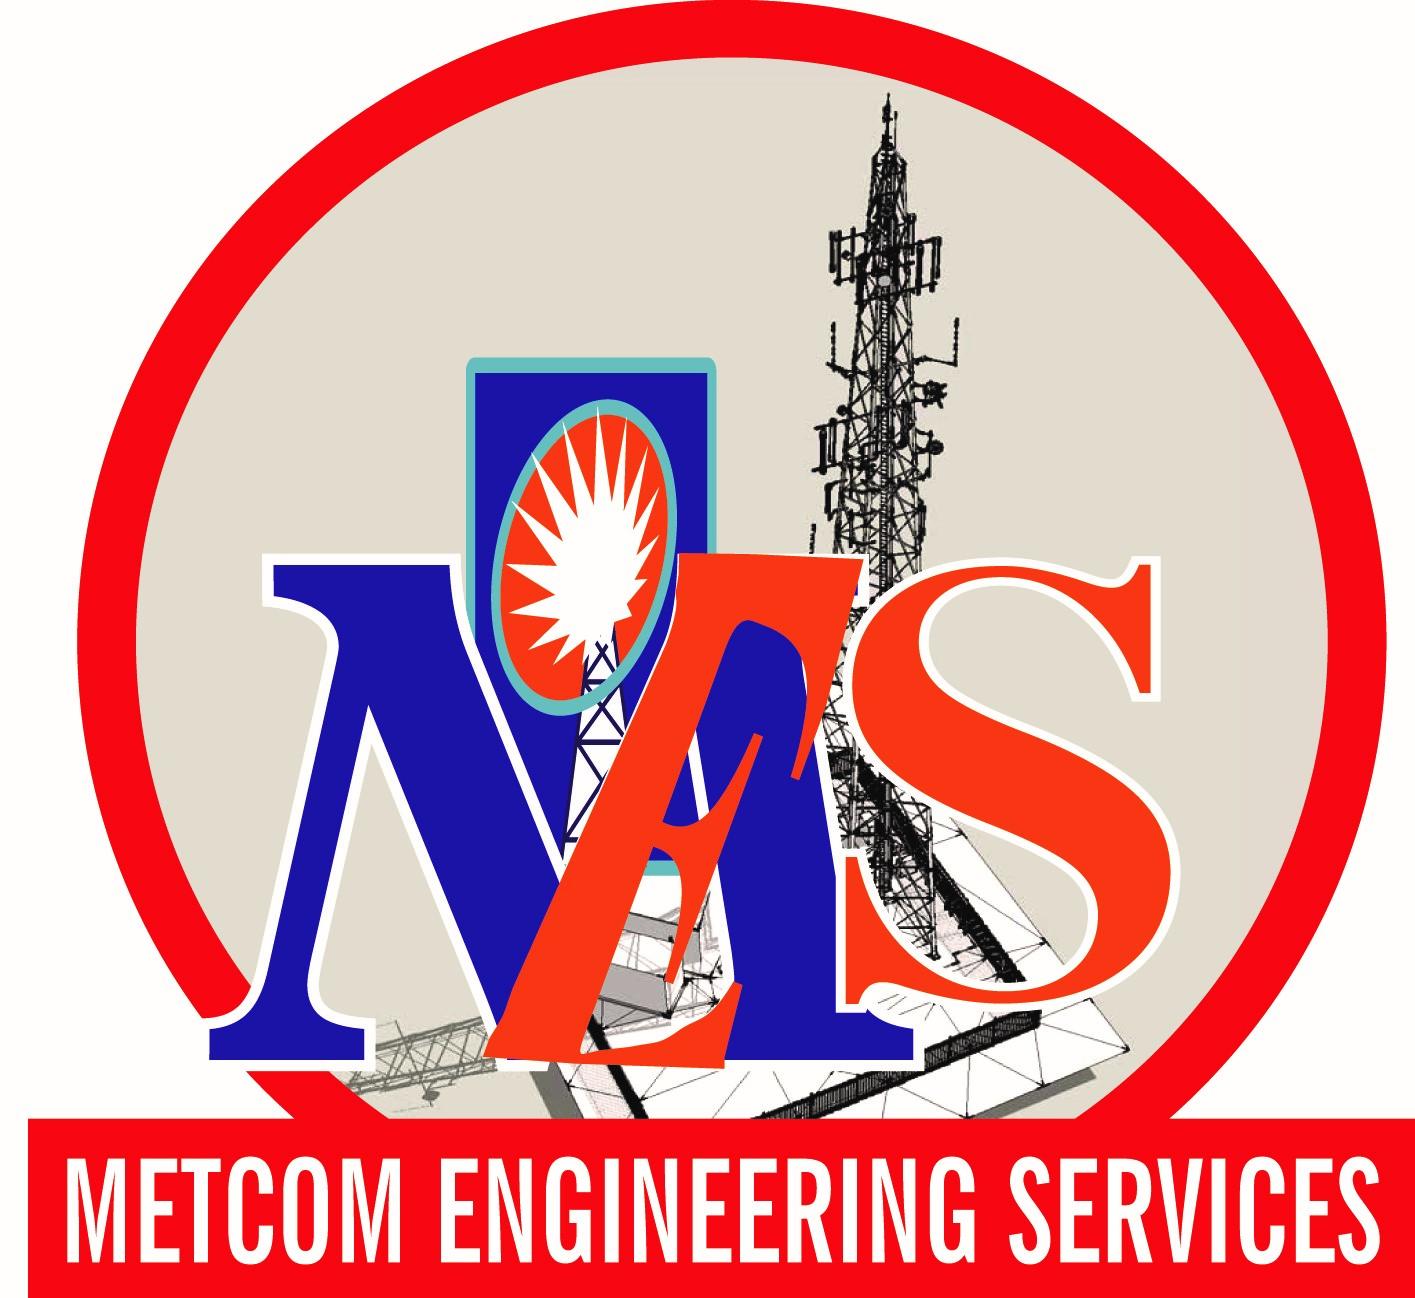 Metcom Engineering Services Ltd